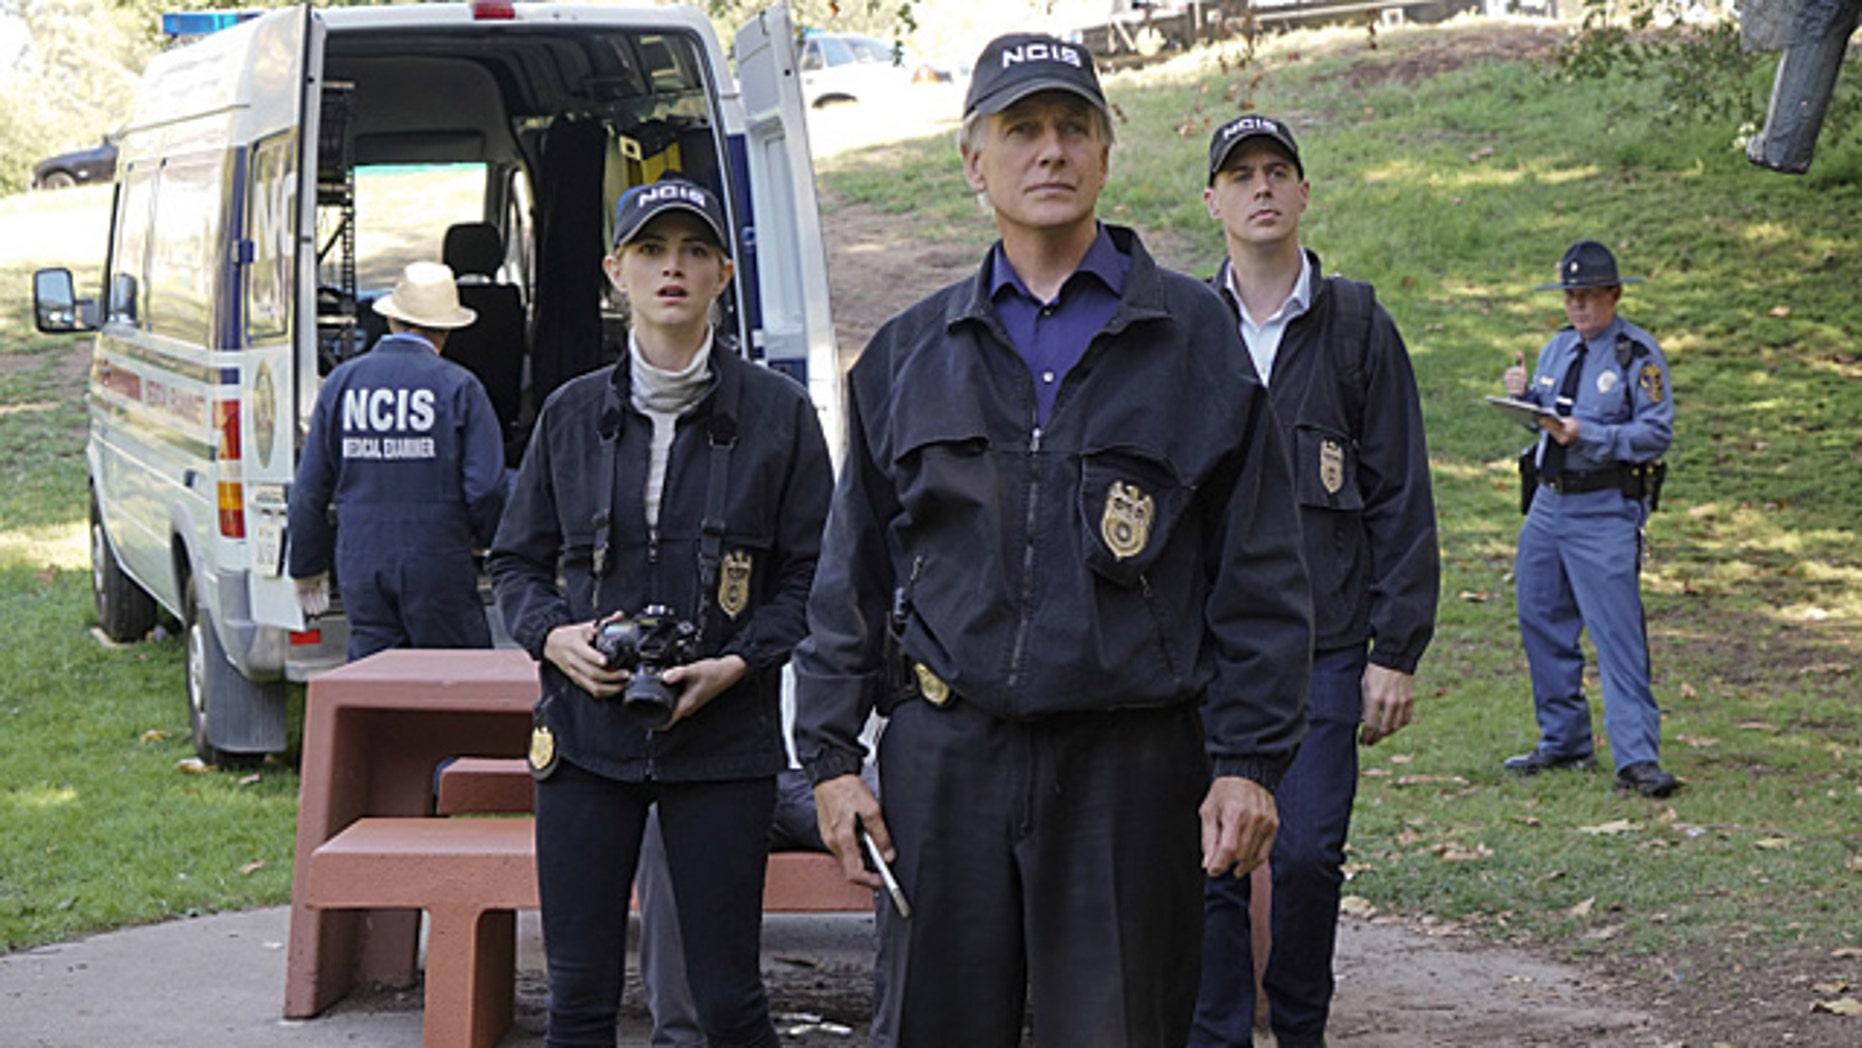 Emily Wickersham, Mark Harmon and Sean Murray on 'NCIS' Photo: (Monty Brinton/CBS)